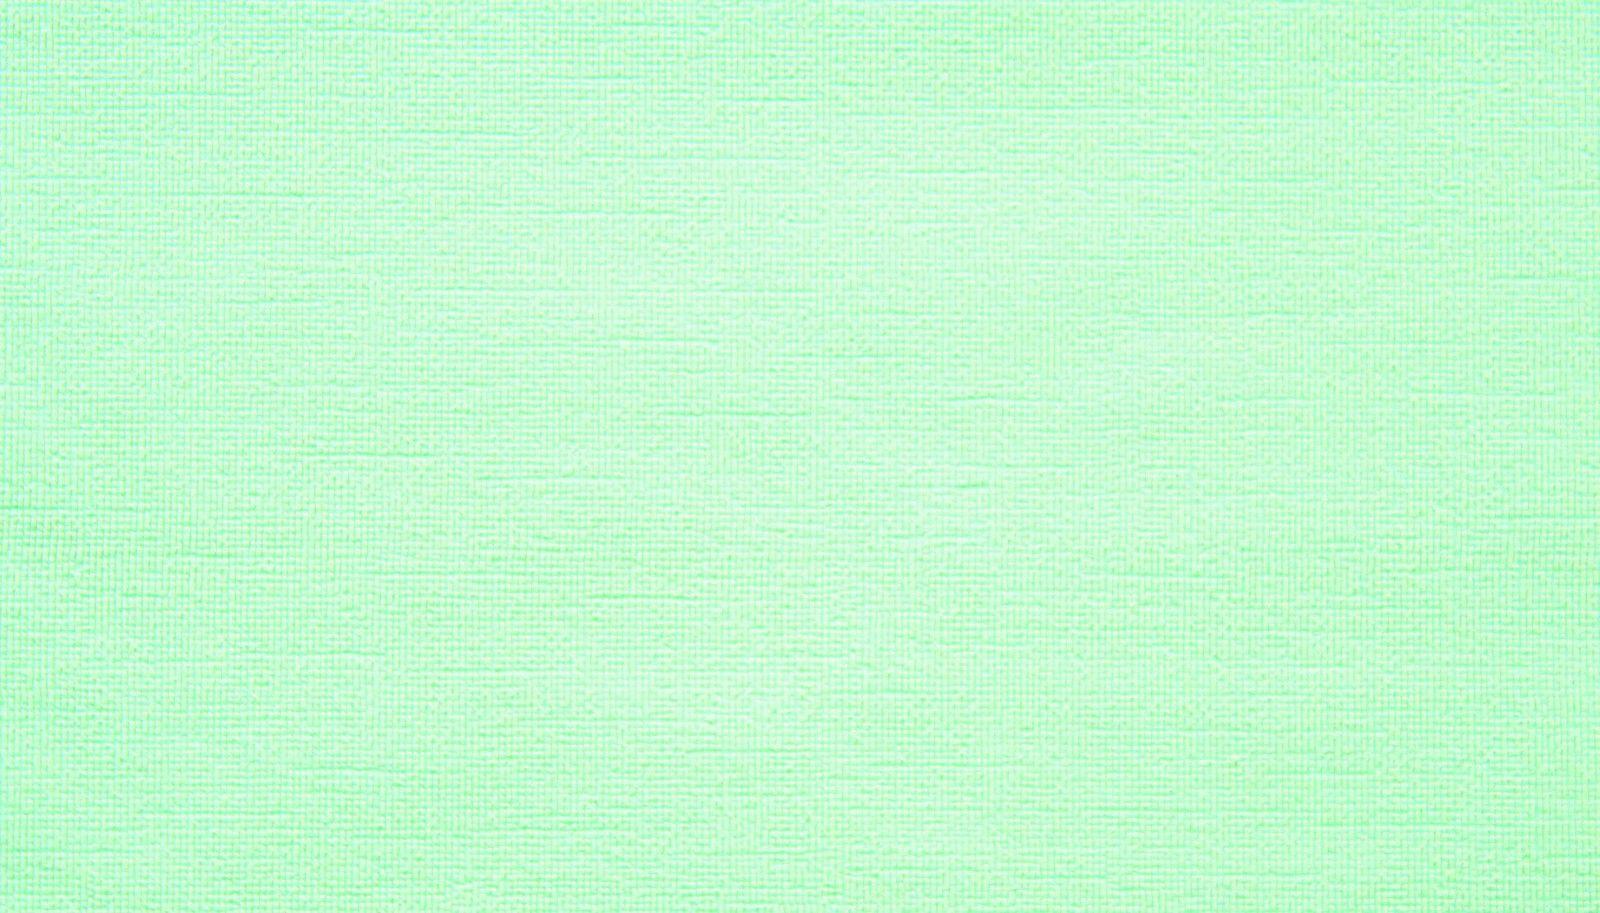 Mint Color Mint Green Desktop Wallpaper | Cool Wallpapers ...